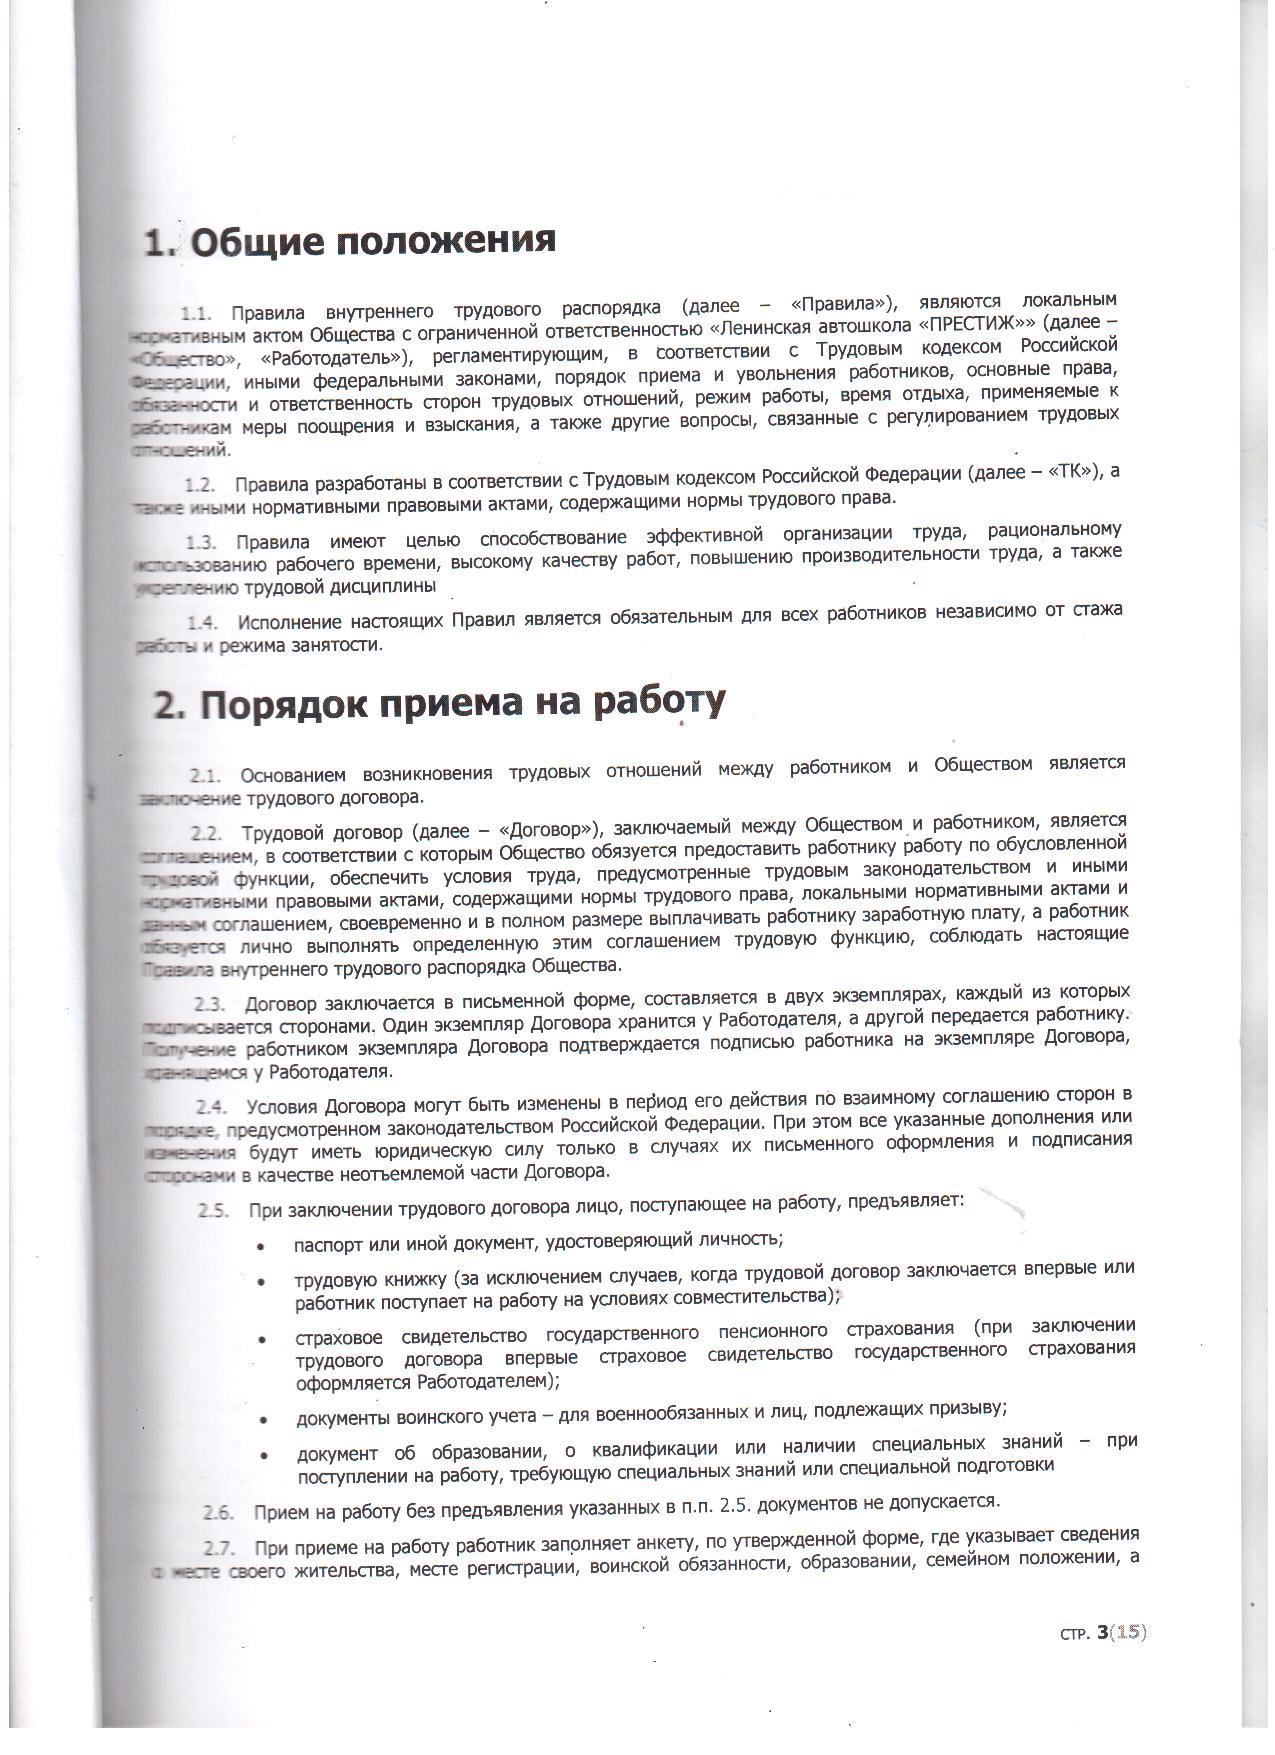 Правила внутреннего трудоговоро распорядка 3